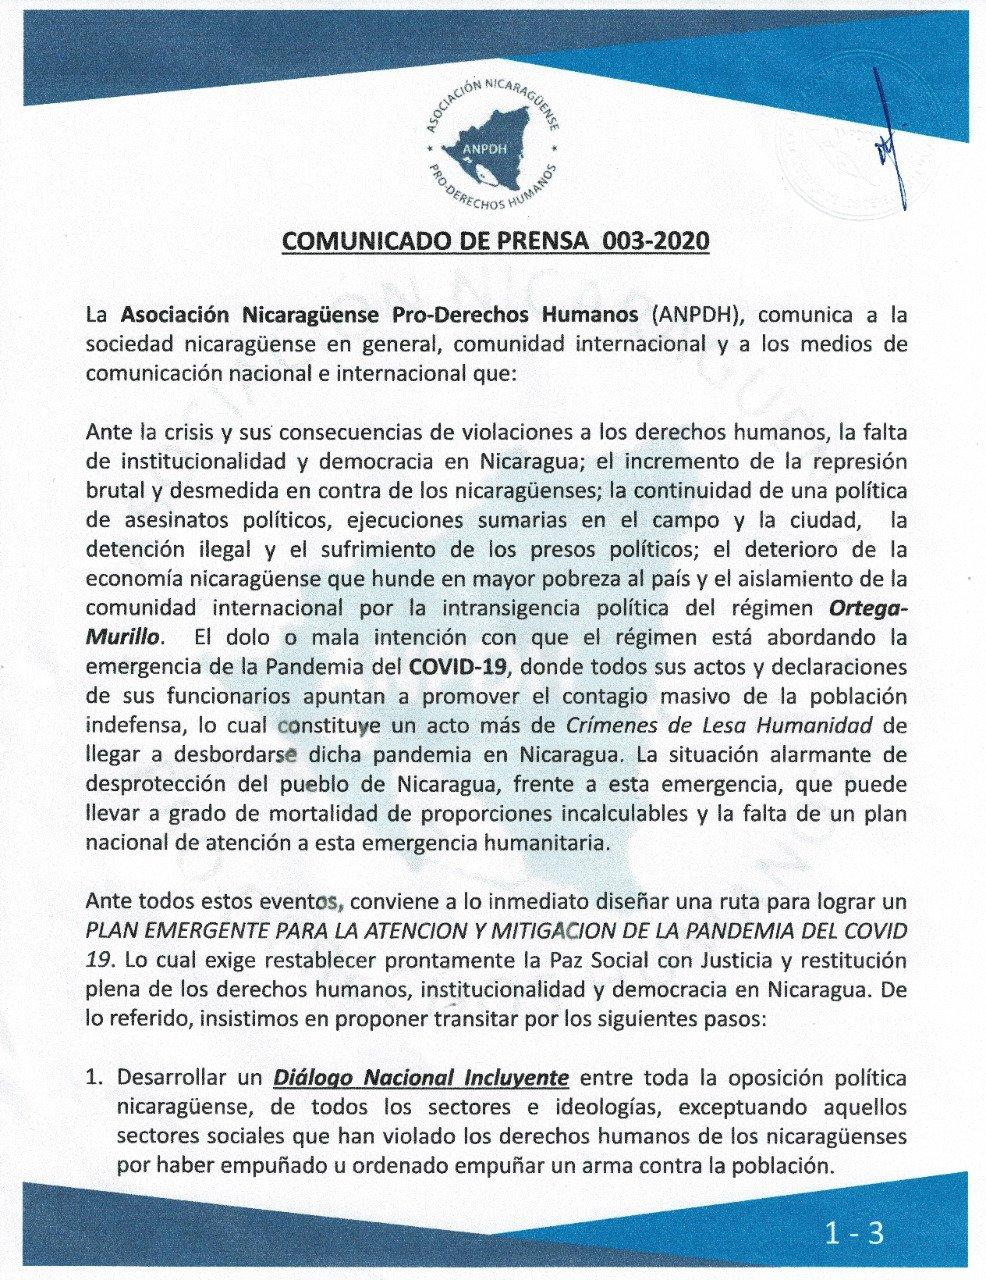 COMUNICADO-DE-PRENSA-03-2020-01.jpg